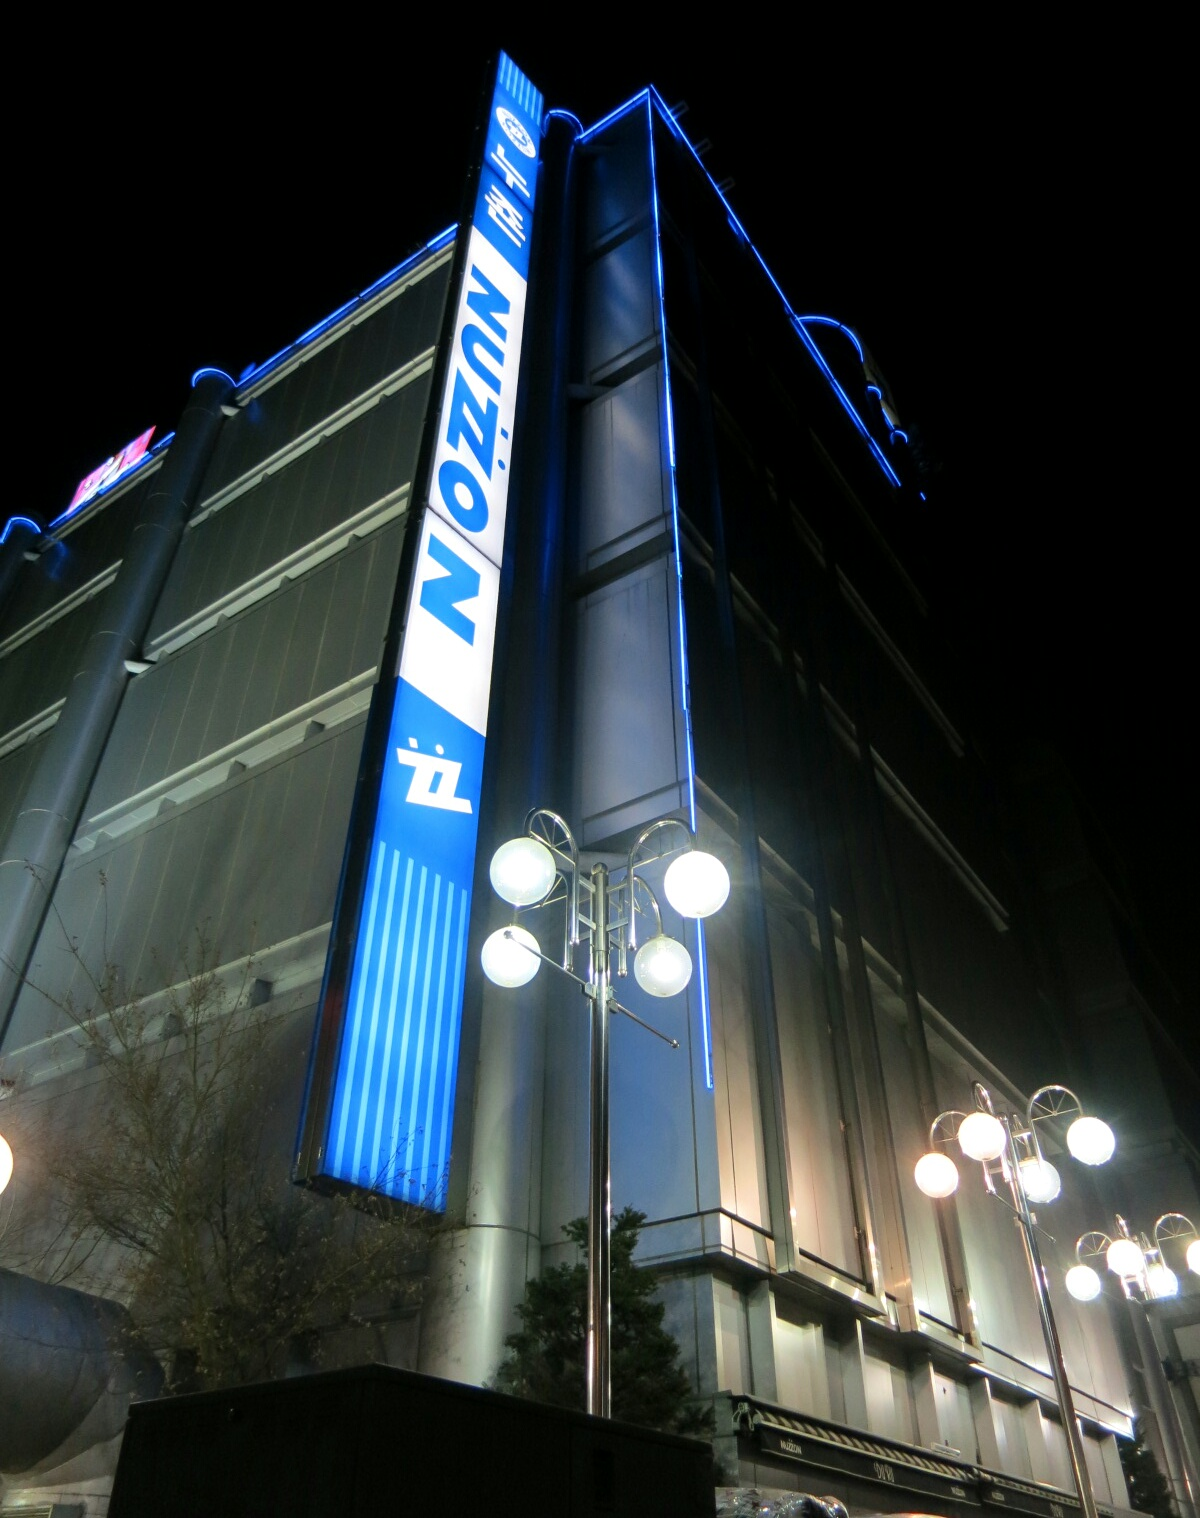 X'mas in Seoul ④真夜中のヌティナム(チッ)_f0236260_0441014.jpg